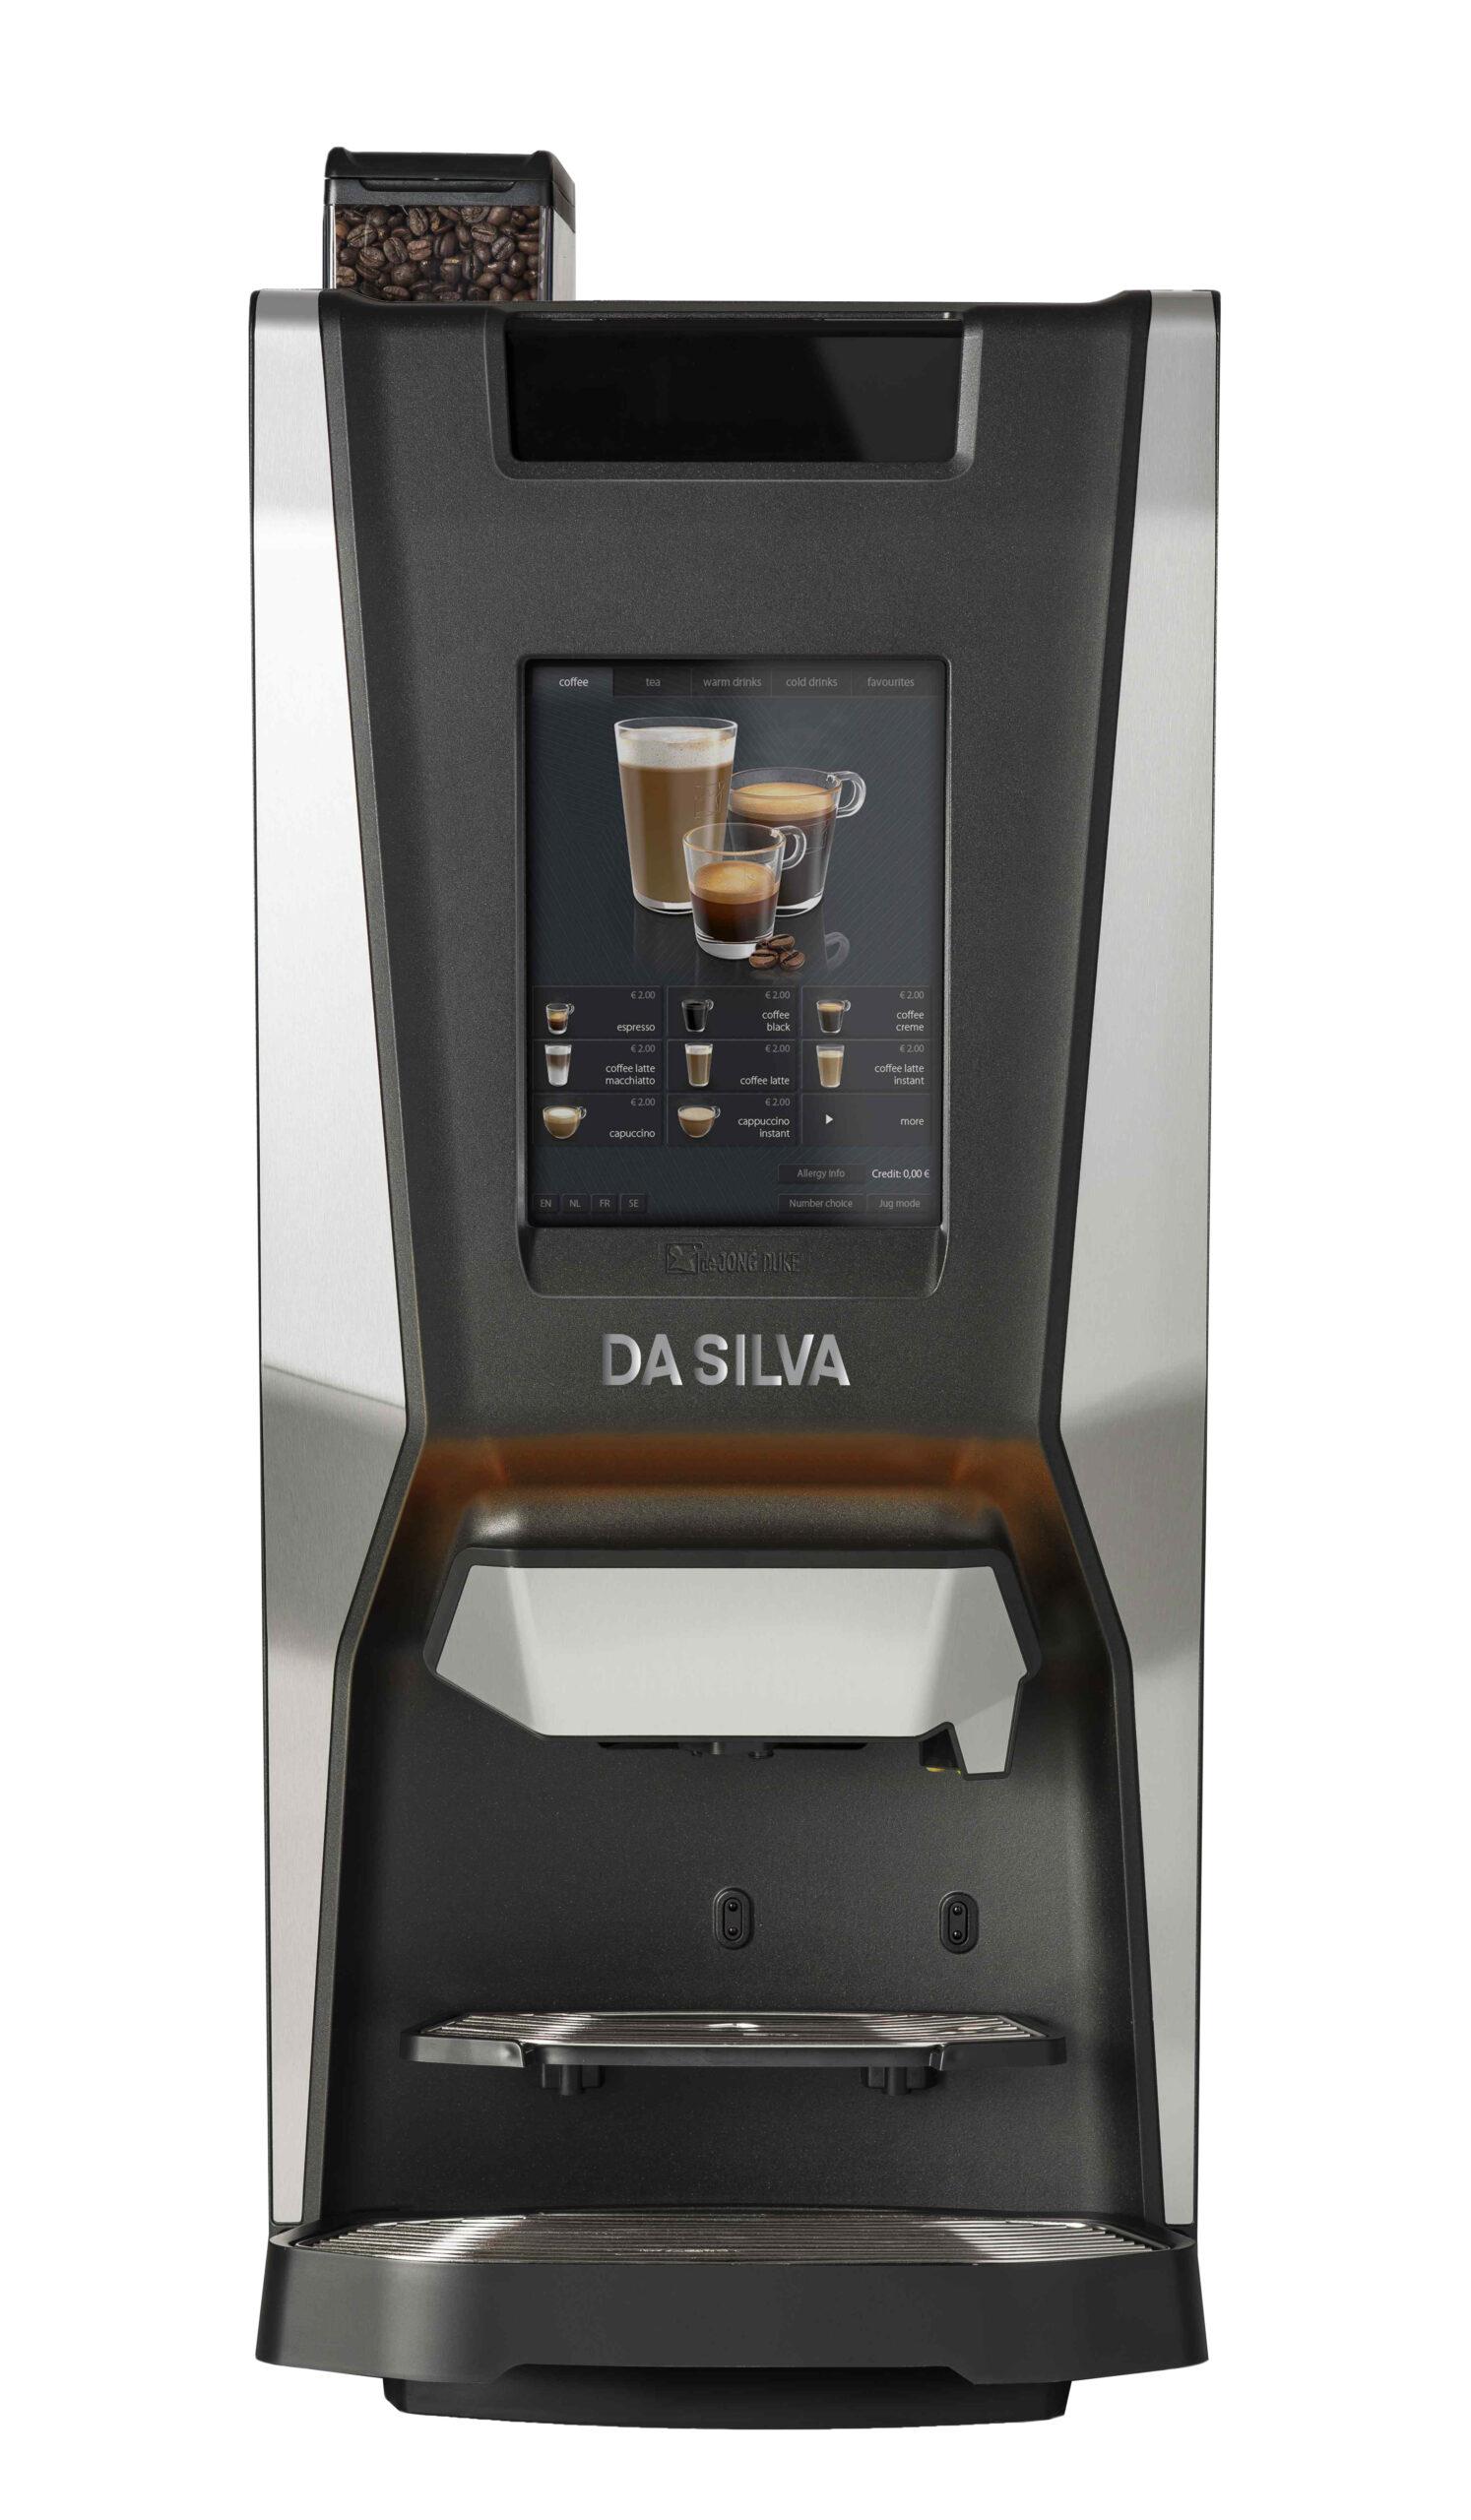 Da Silva DS-4 koffiemachine